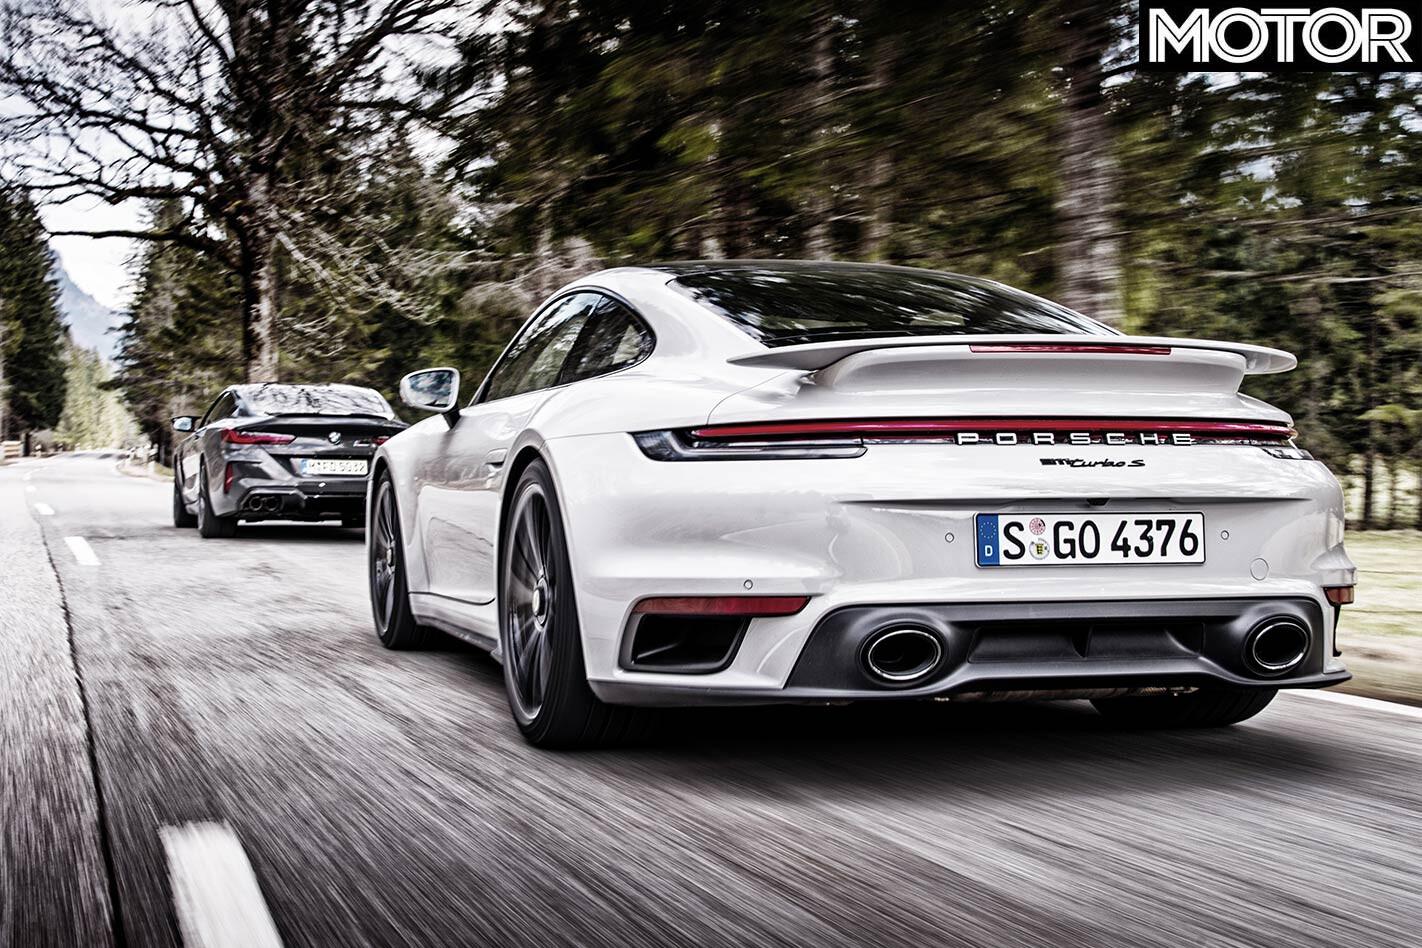 BMW M8 Competition vs Porsche 911 Turbo S